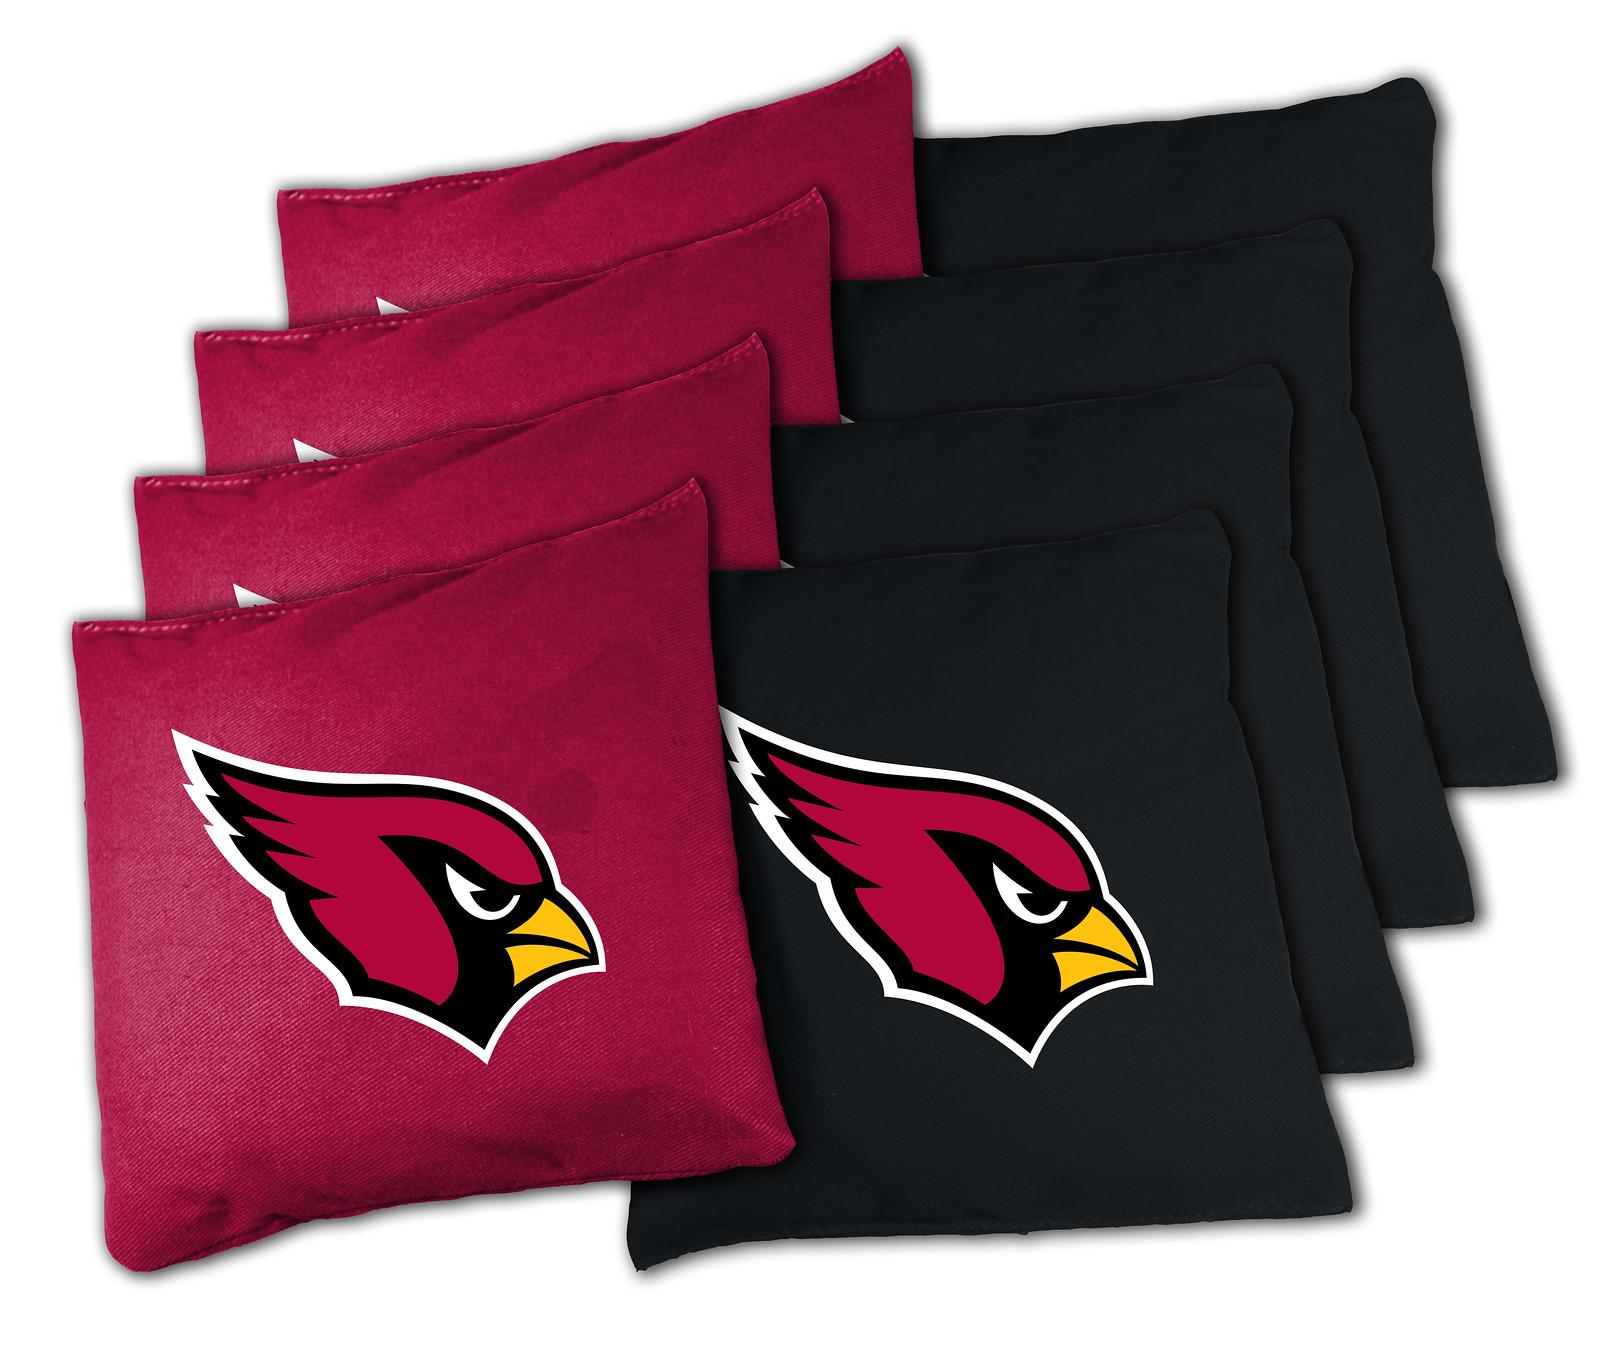 Arizona Cardinals Cornhole Bags